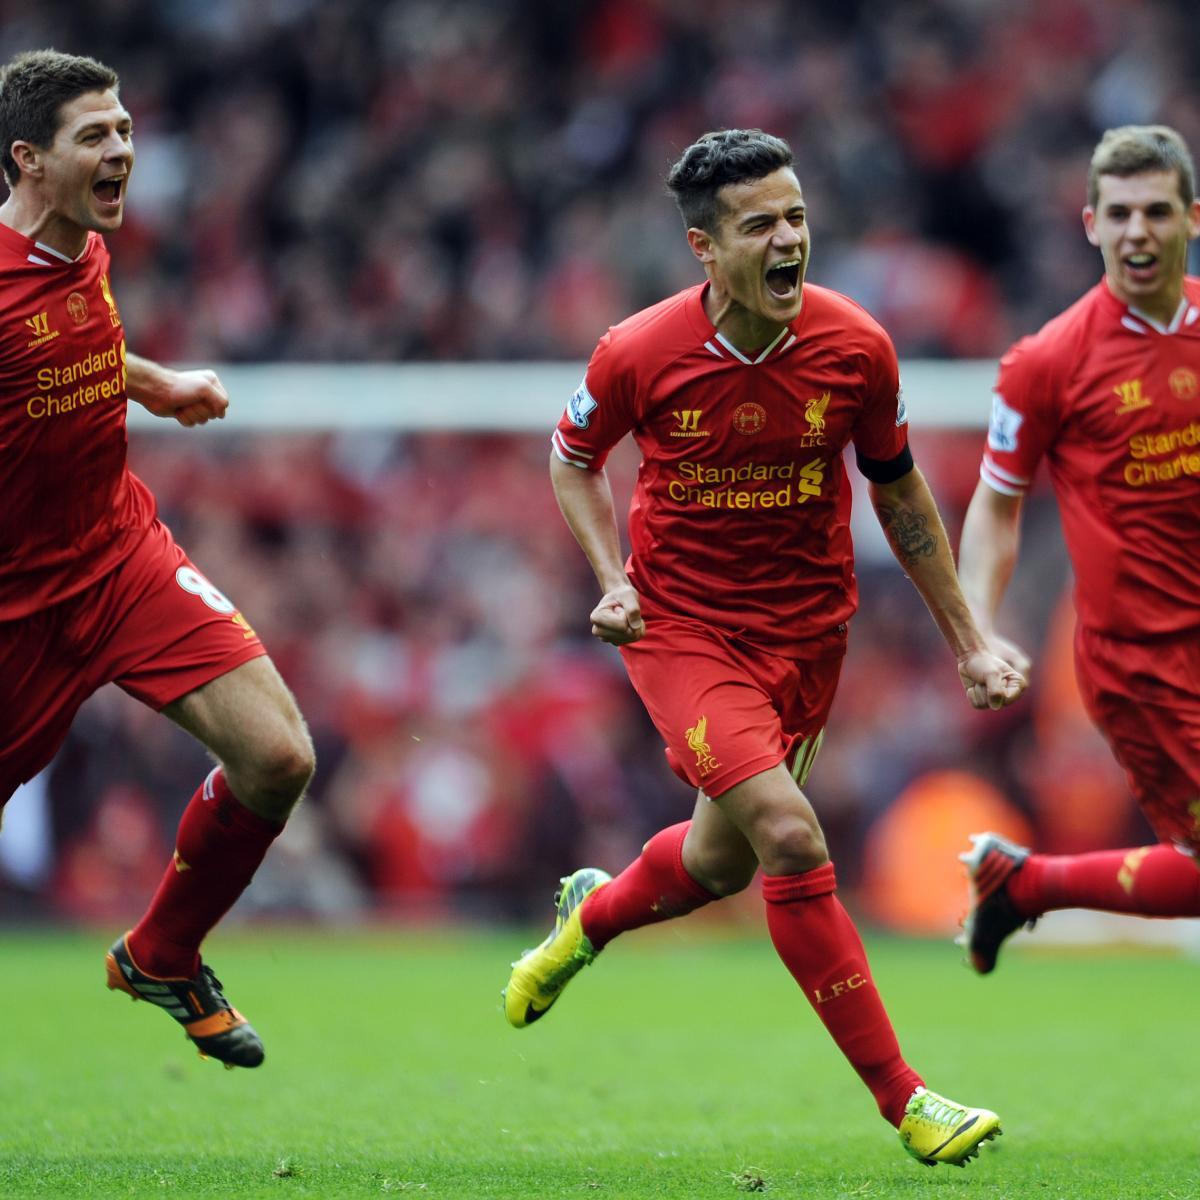 Luis Suarez And Steven Gerrard Reunited: Twitter Reacts To Luis Suarez, Steven Gerrard And More